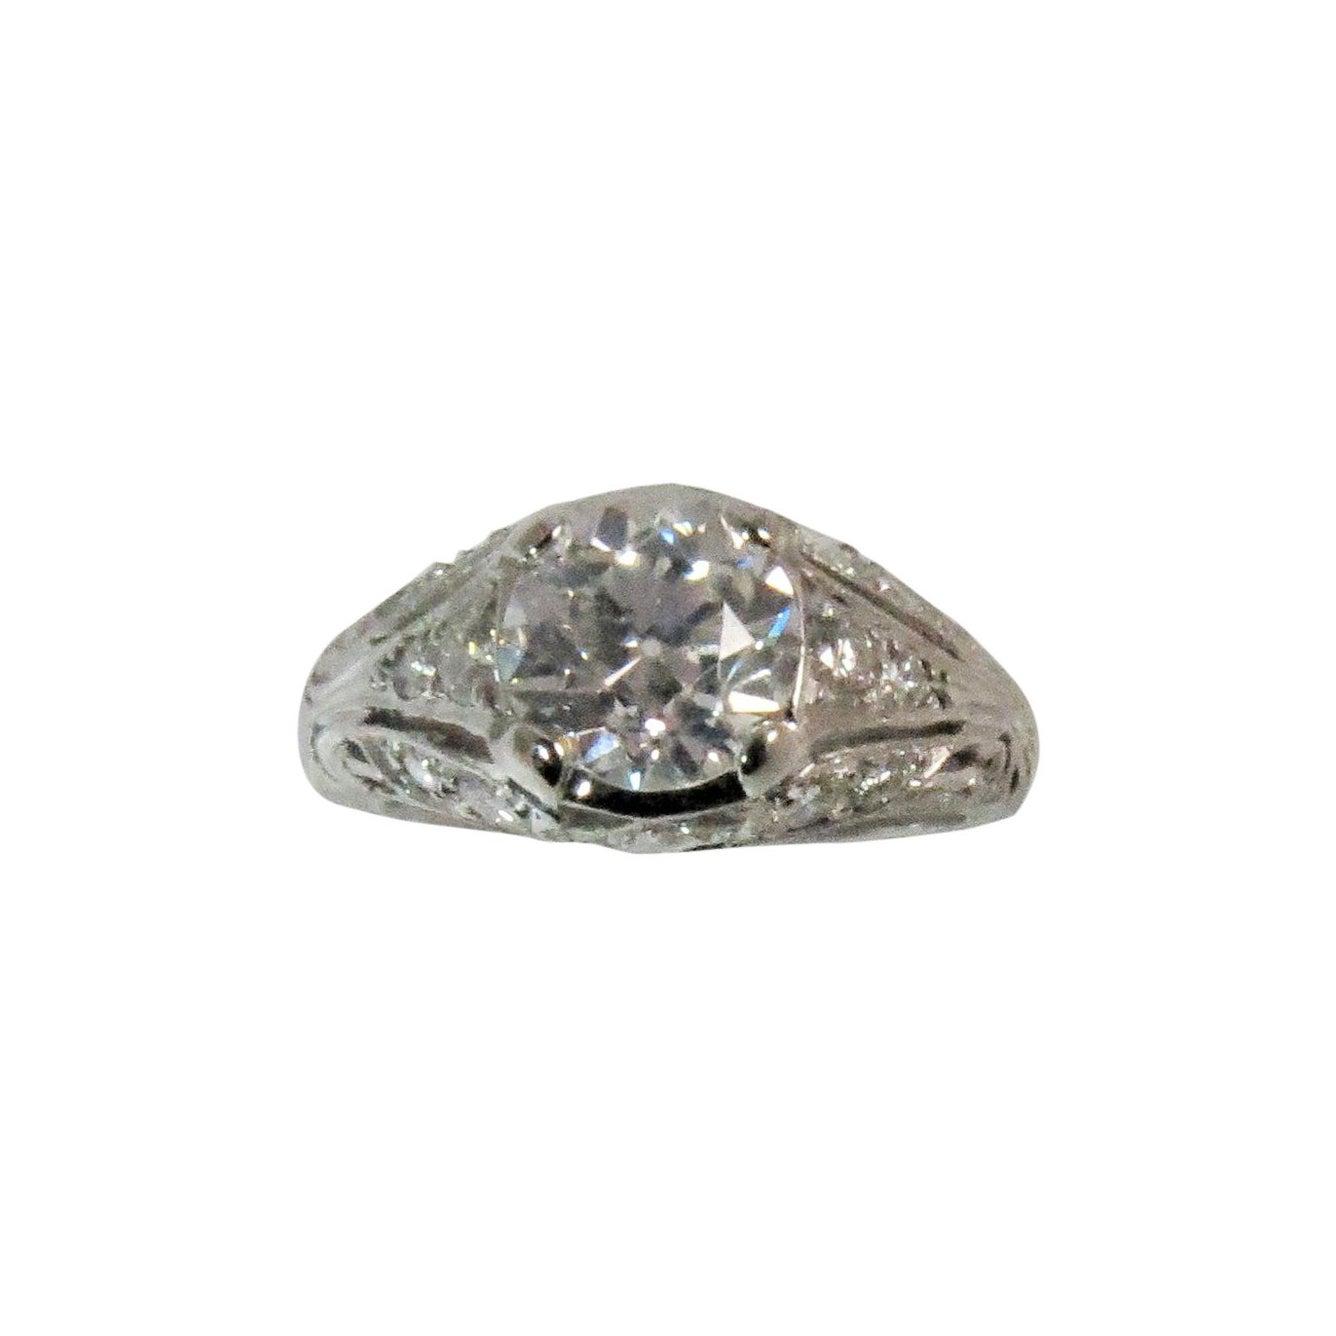 Vintage Platinum Ring With European Cut Diamond